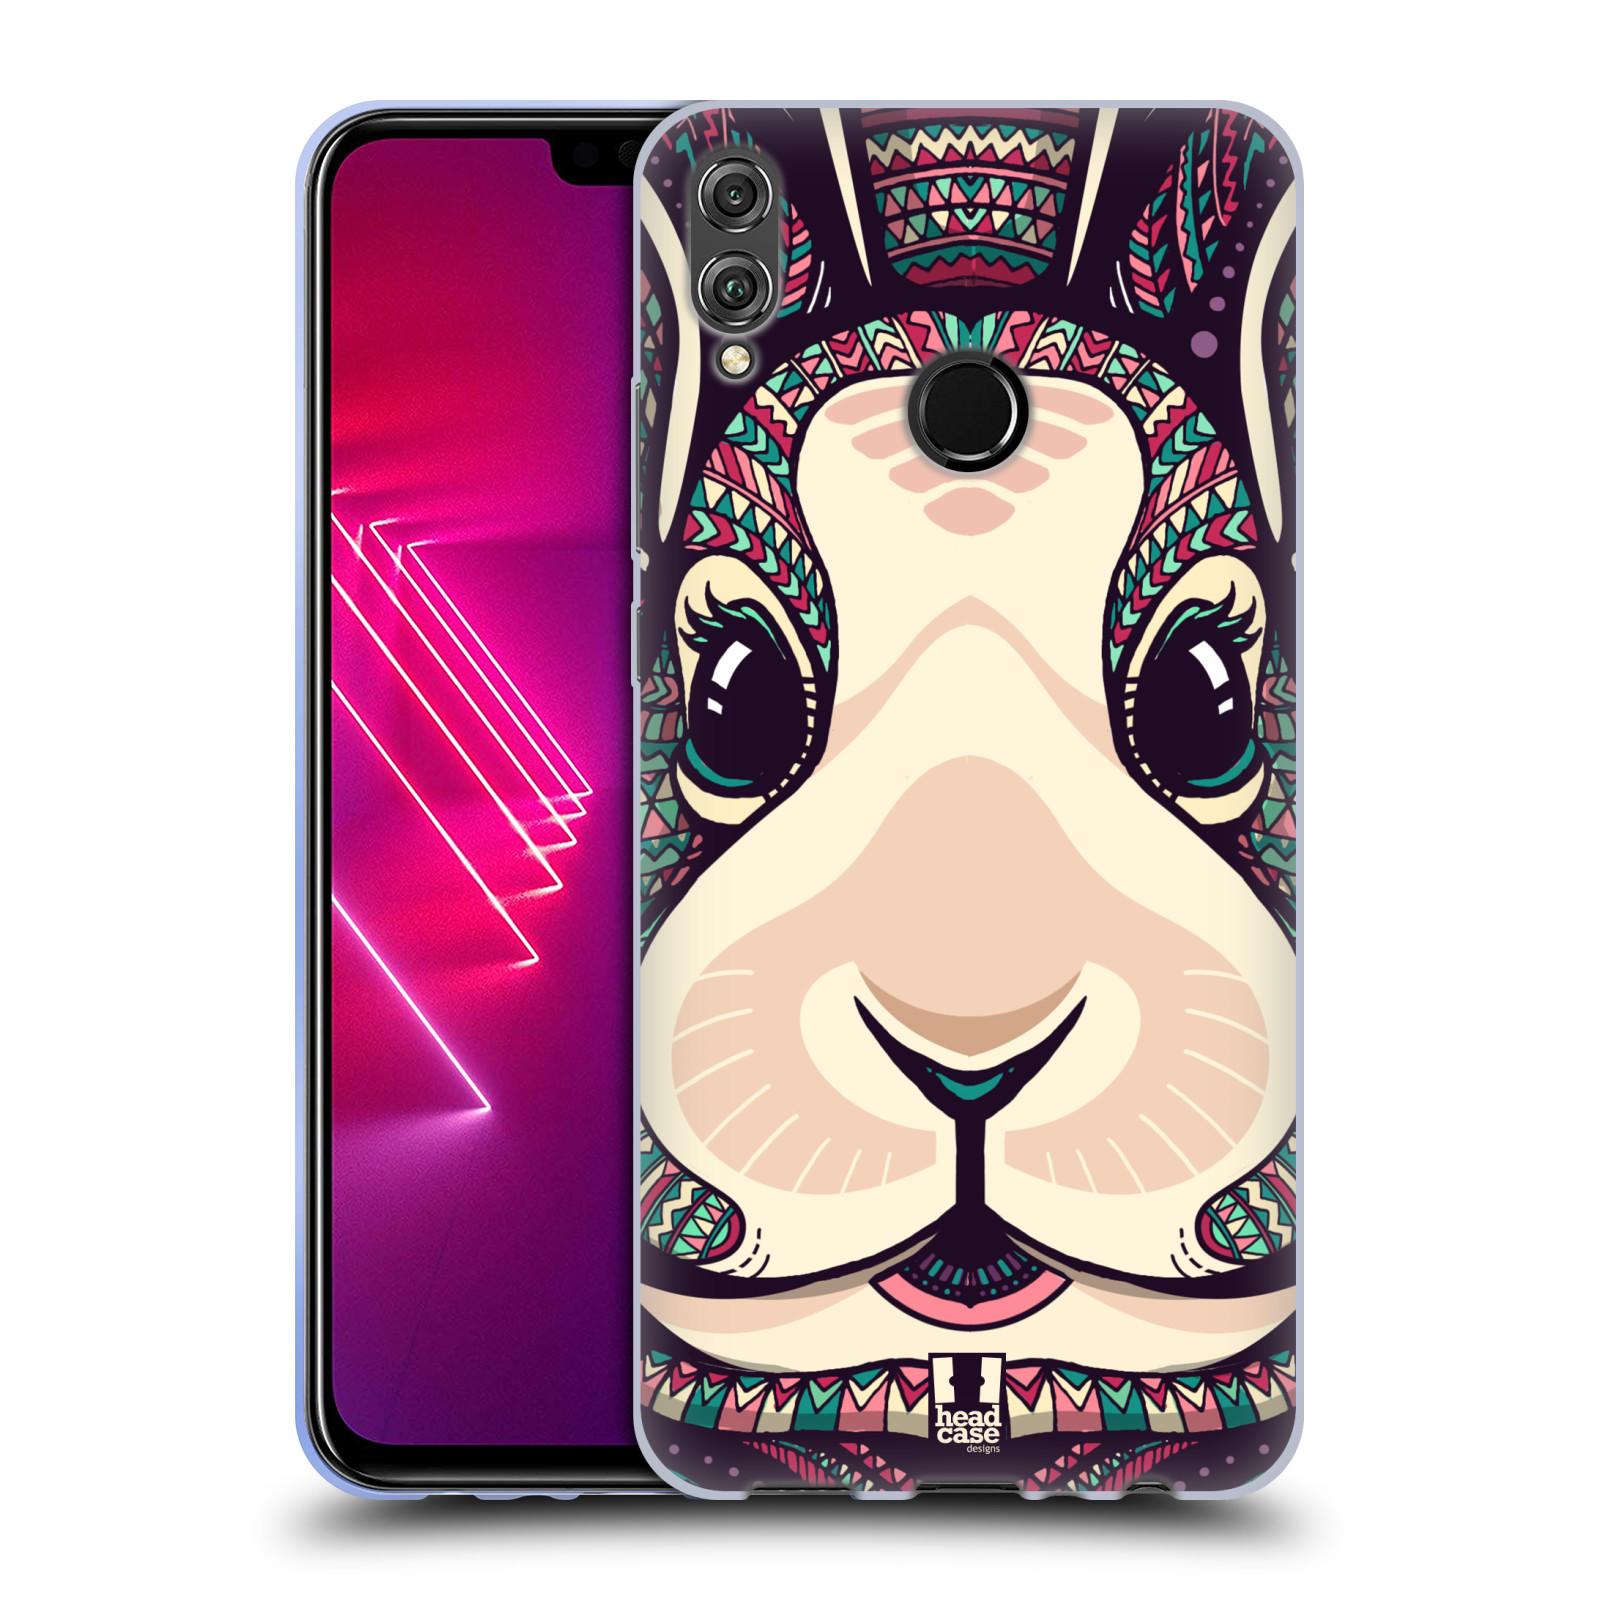 Silikonové pouzdro na mobil Honor View 10 Lite - Head Case - AZTEC ZAJÍČEK